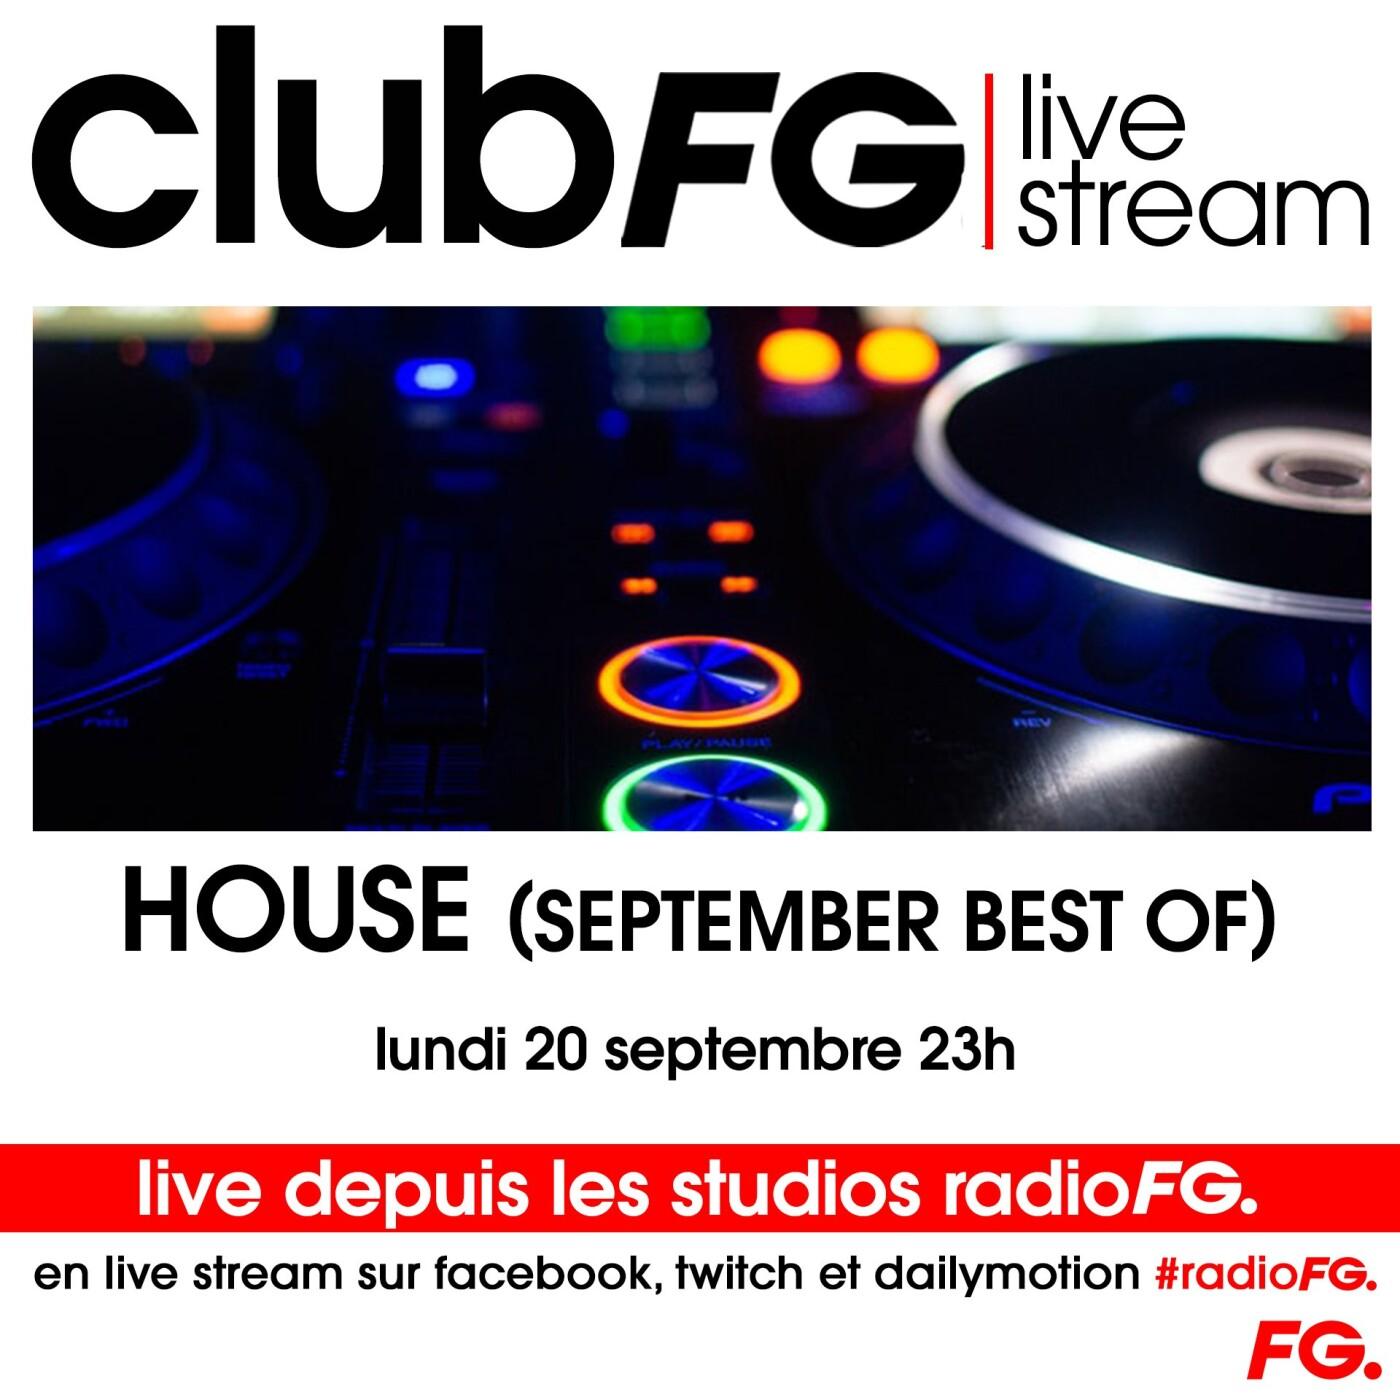 CLUB FG LIVE STREAM : BEST OF HOUSE SEPTEMBER